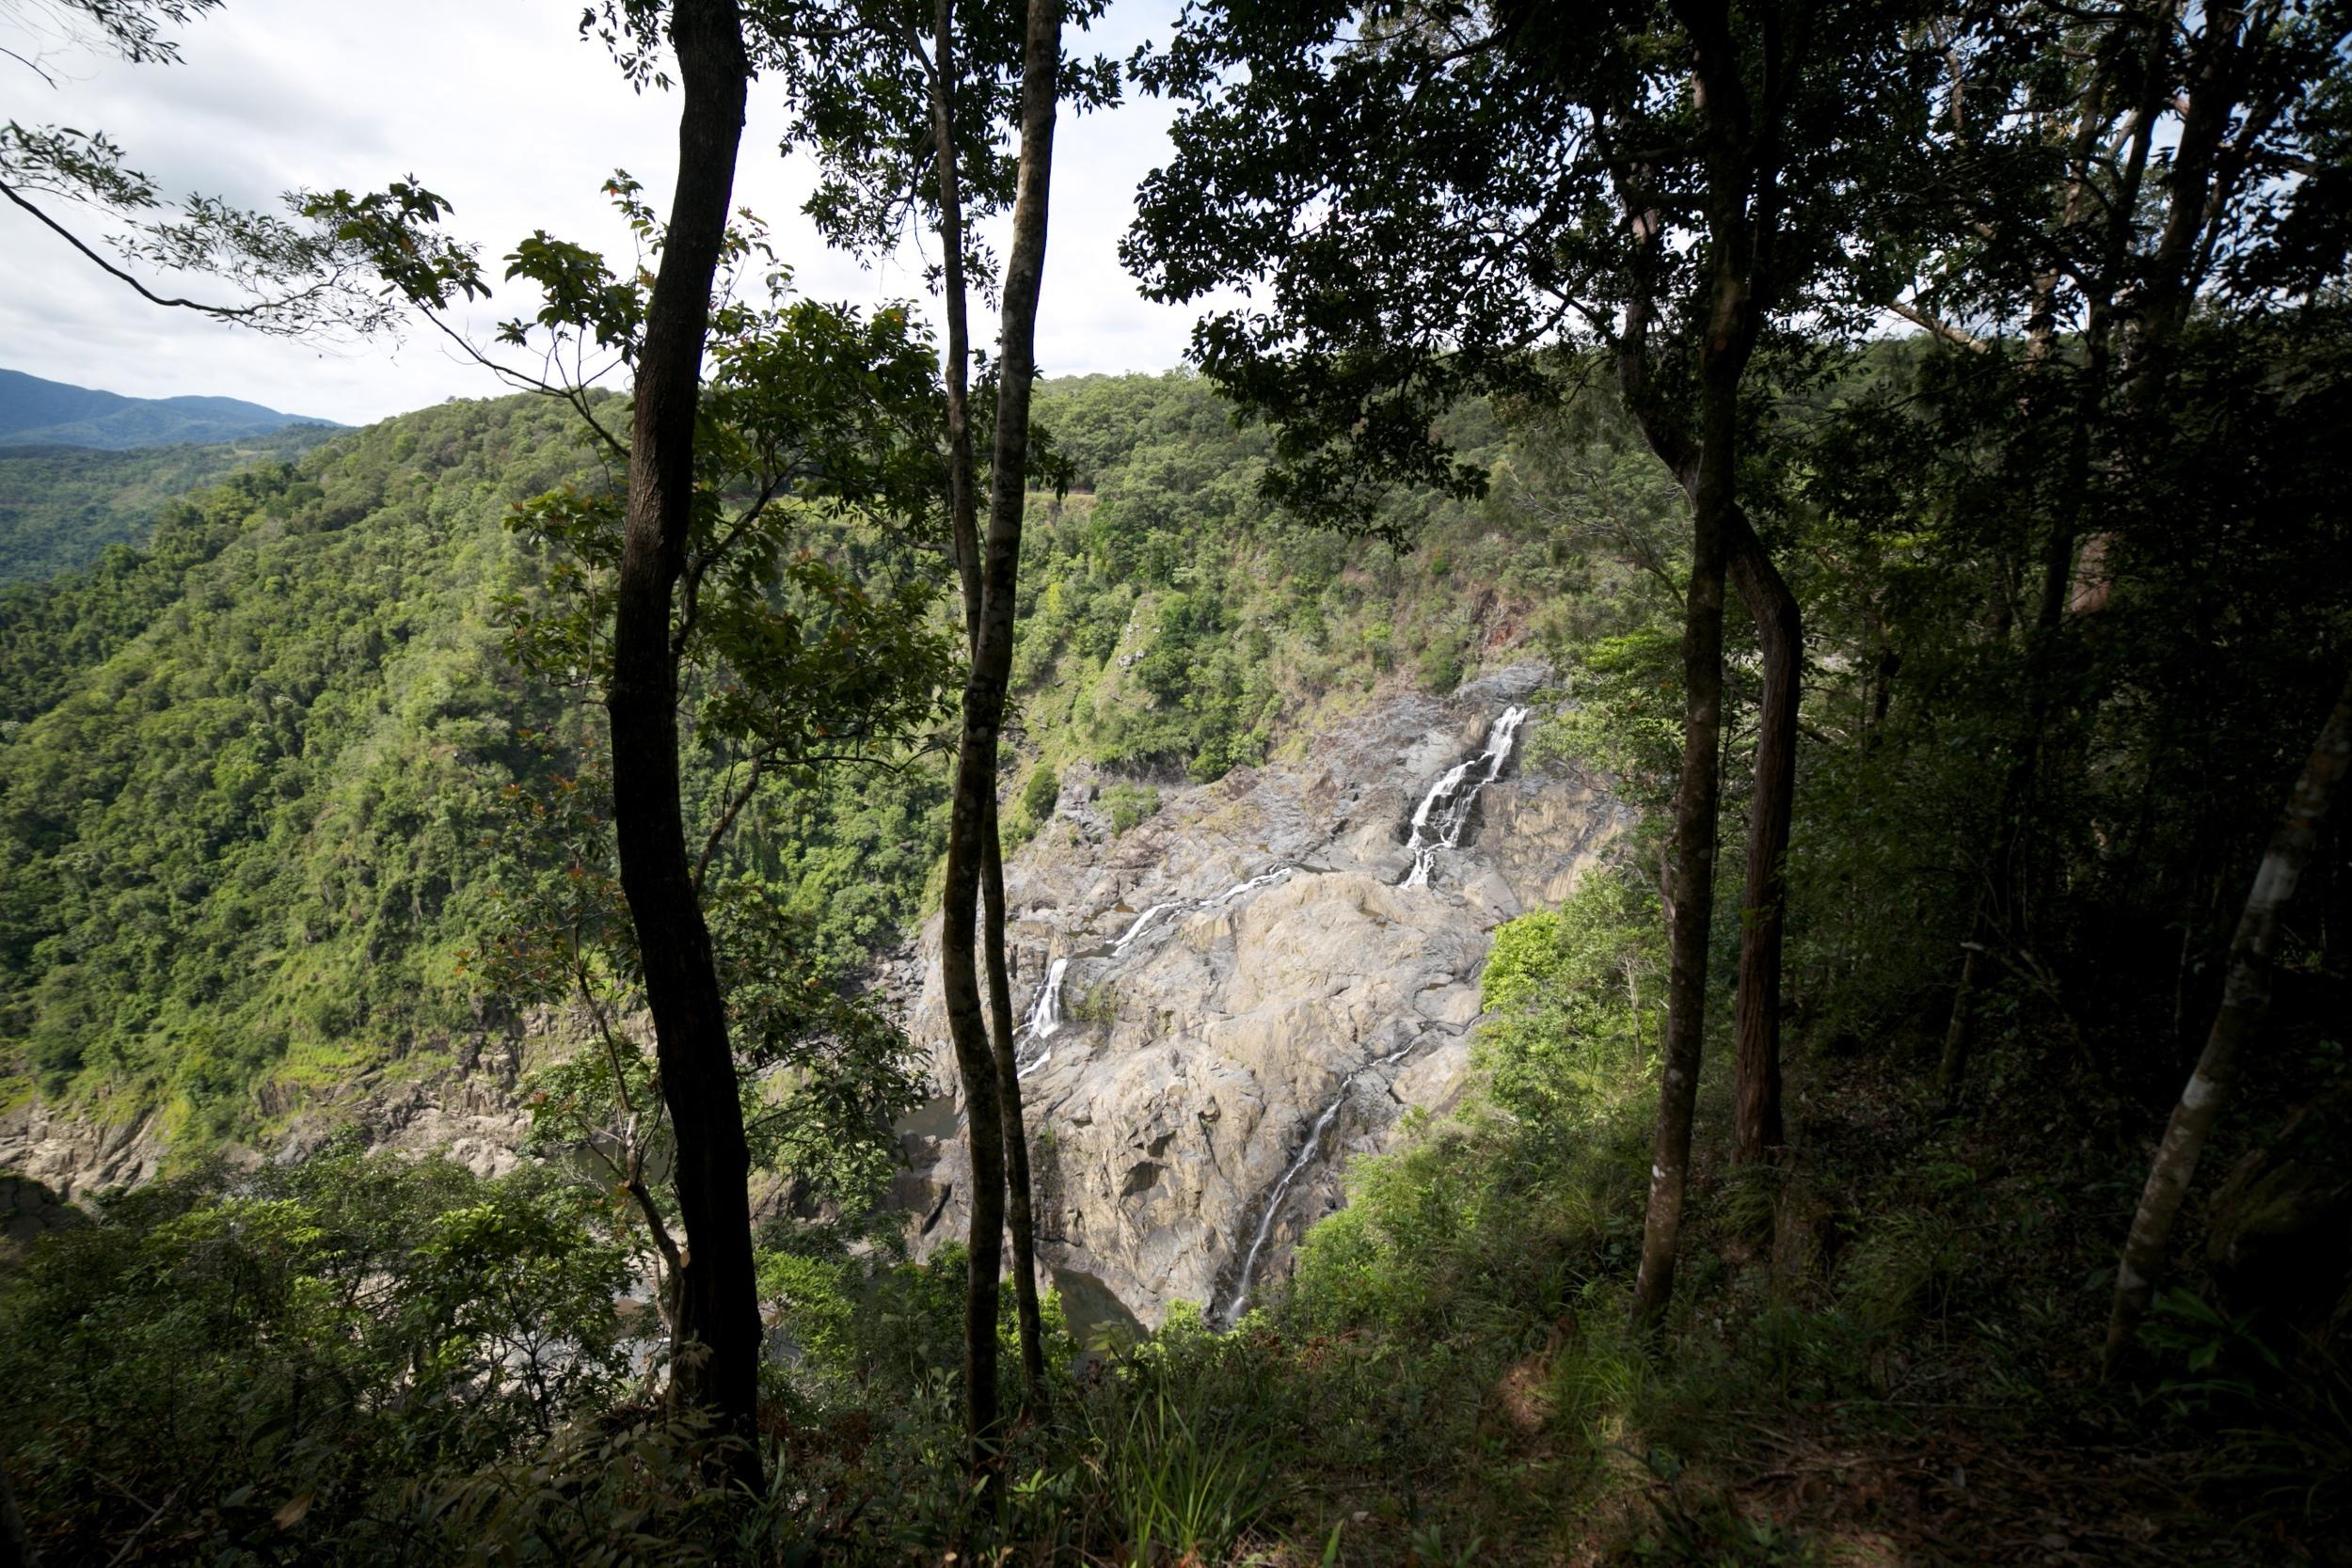 Barron Falls seen through the rainforest trees.